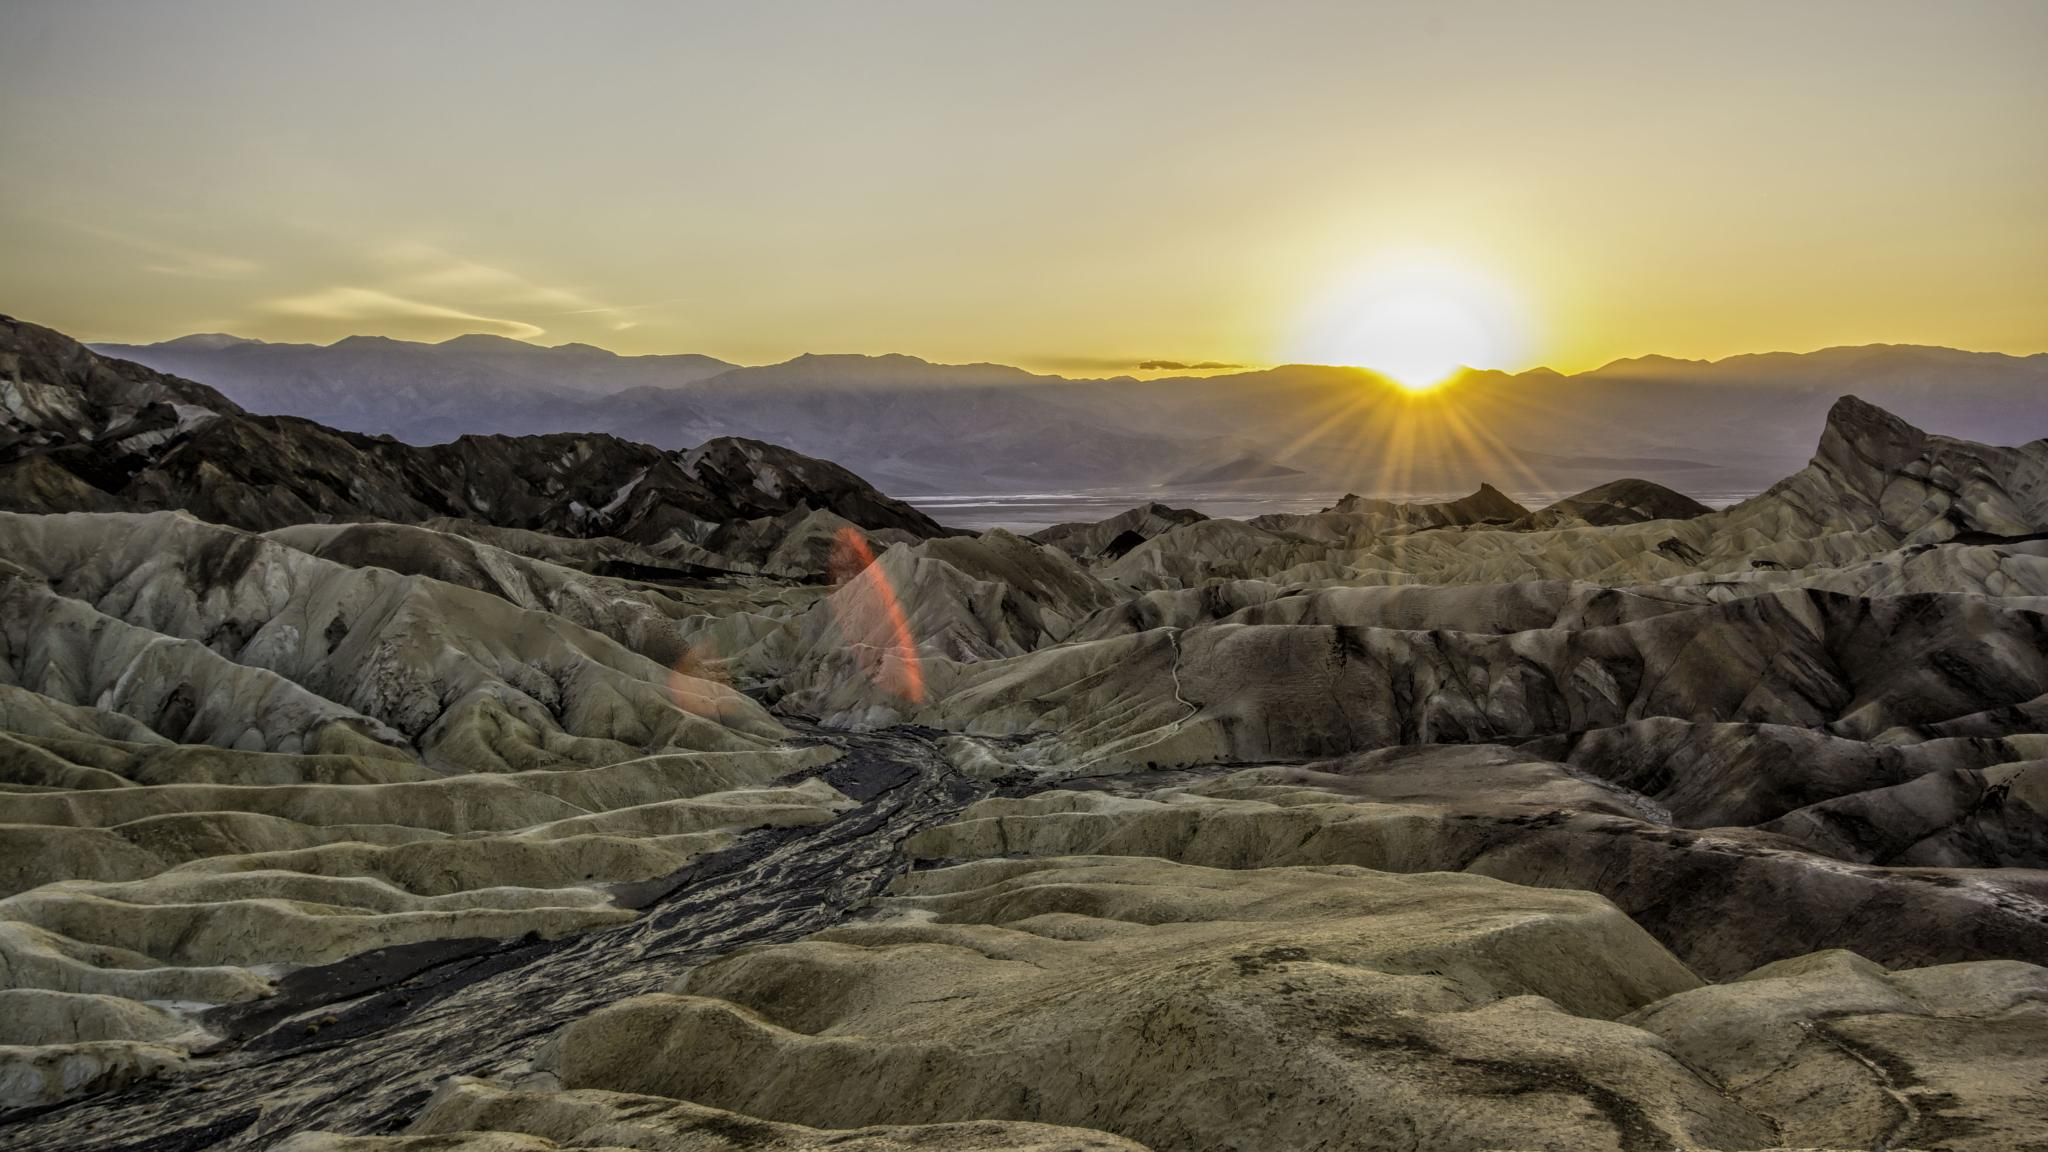 Zabriskie Point, Death Valley National Park, CA by steve jordan